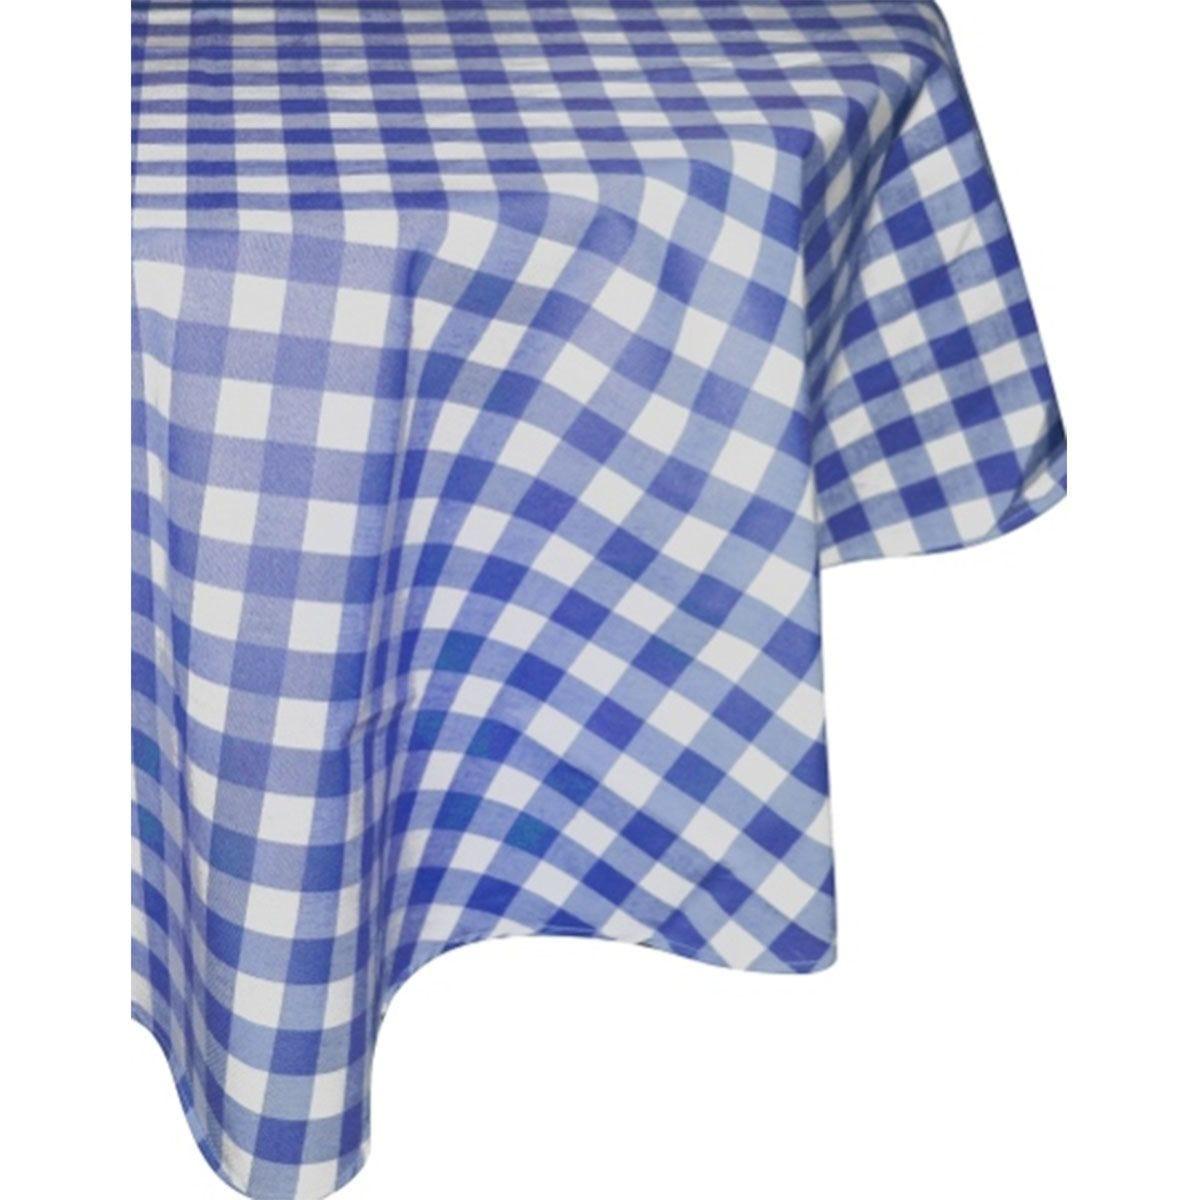 Le Chateau Gingham Tablecloth - Blue